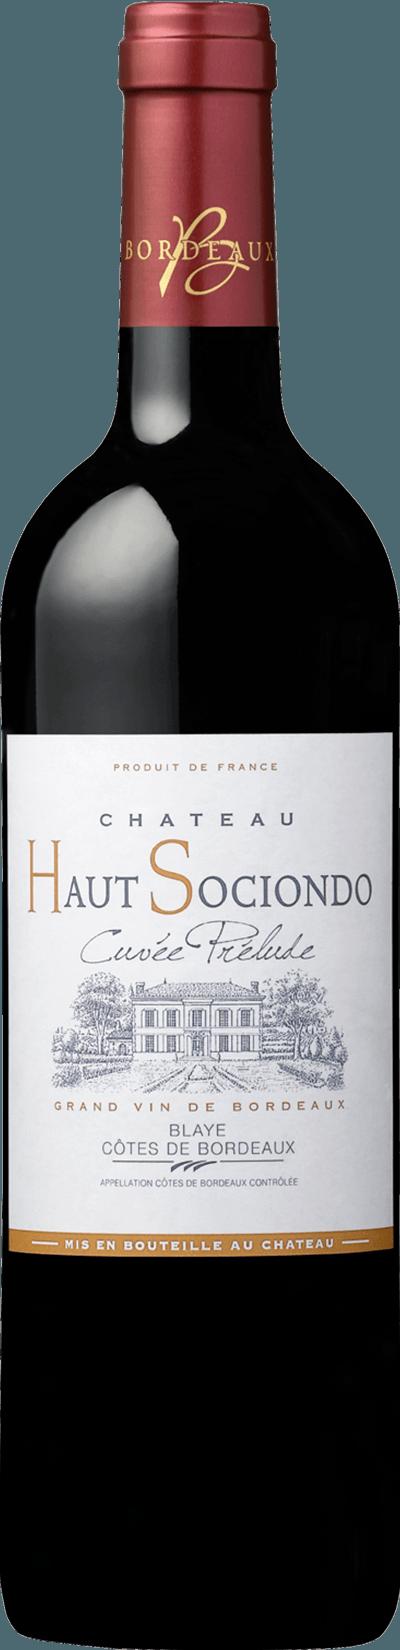 Château Haut Sociondo – Cuvée Prélude